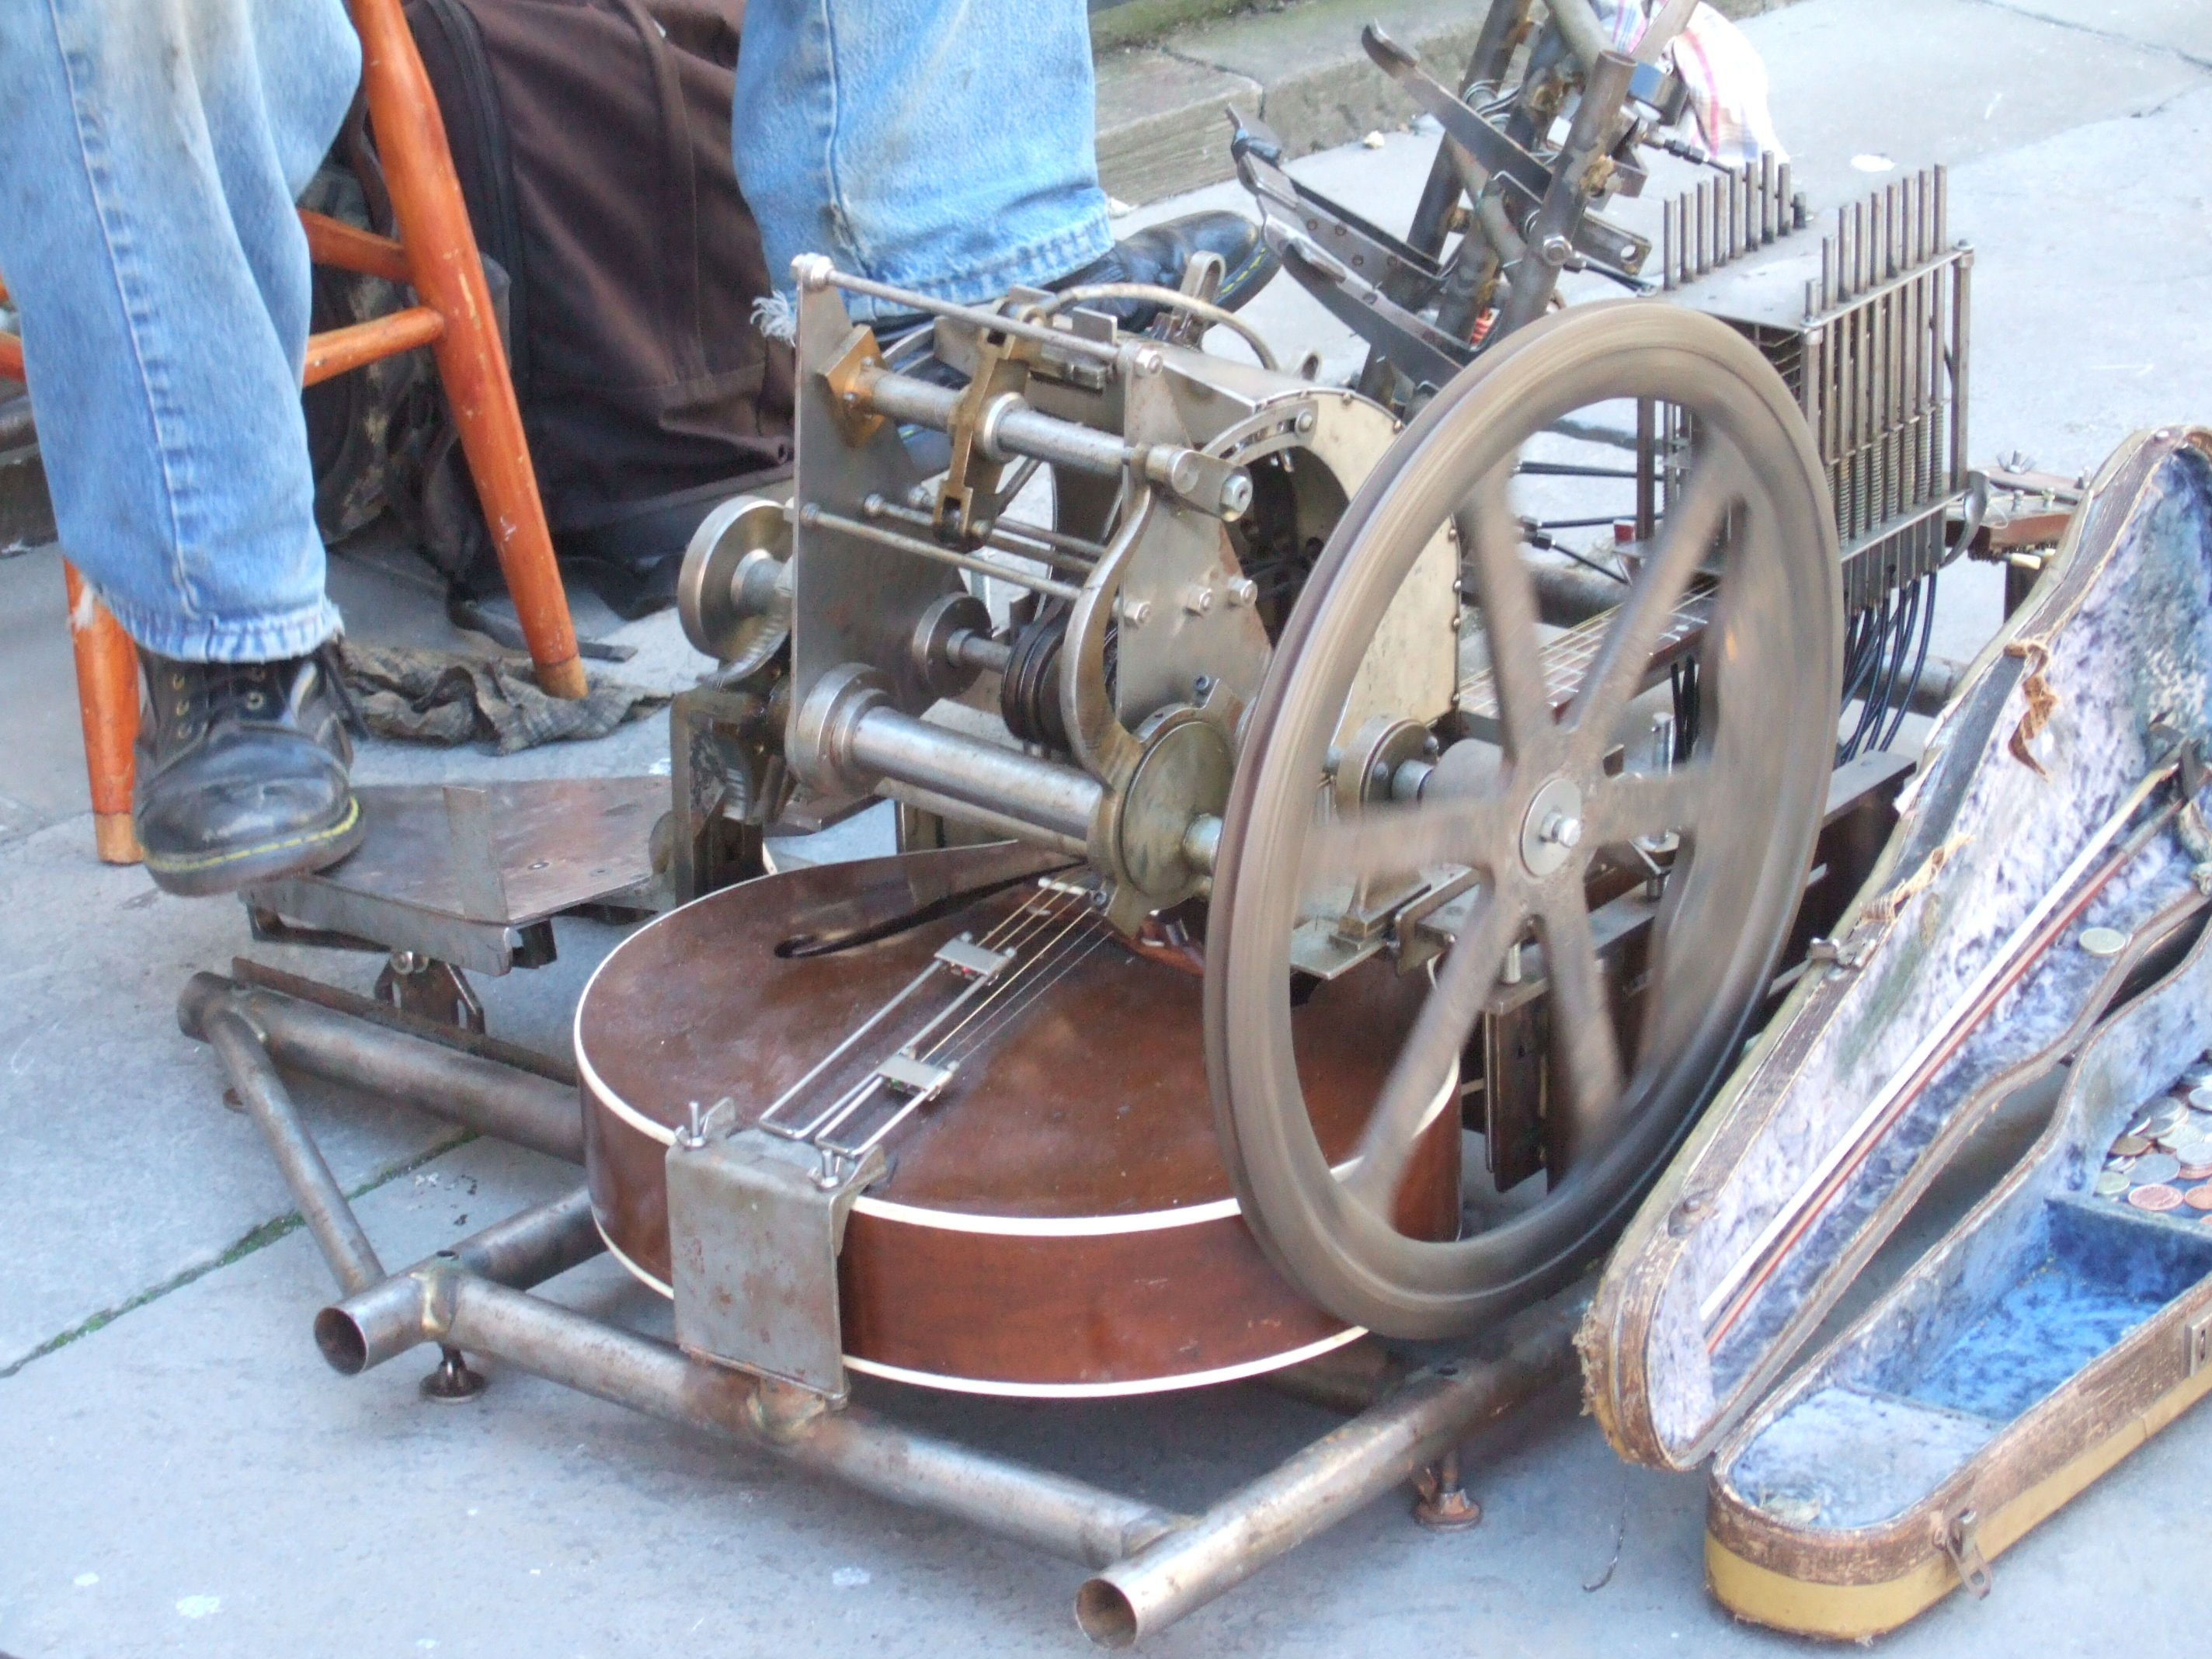 Bandit music machine and its creator, Philip Wickenden